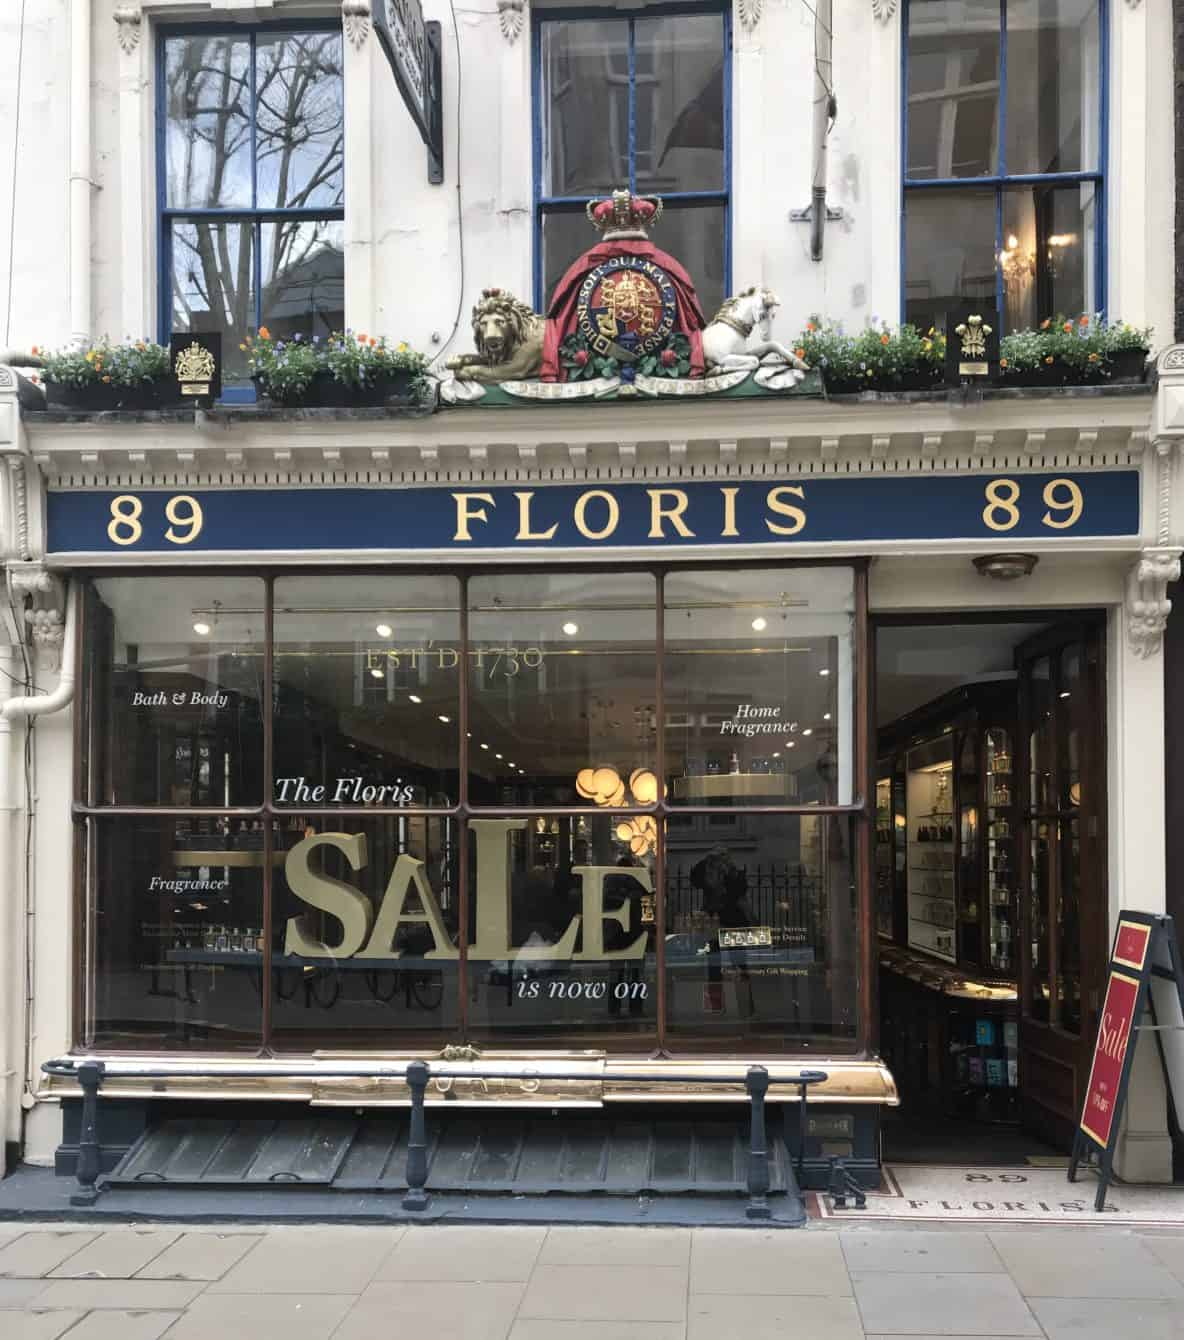 Floris perfume shop, Jermyn Street. St. James's, Unique Boutiques Tour, Fashion Tours London, fashion walks and shopping tours for fashionistas